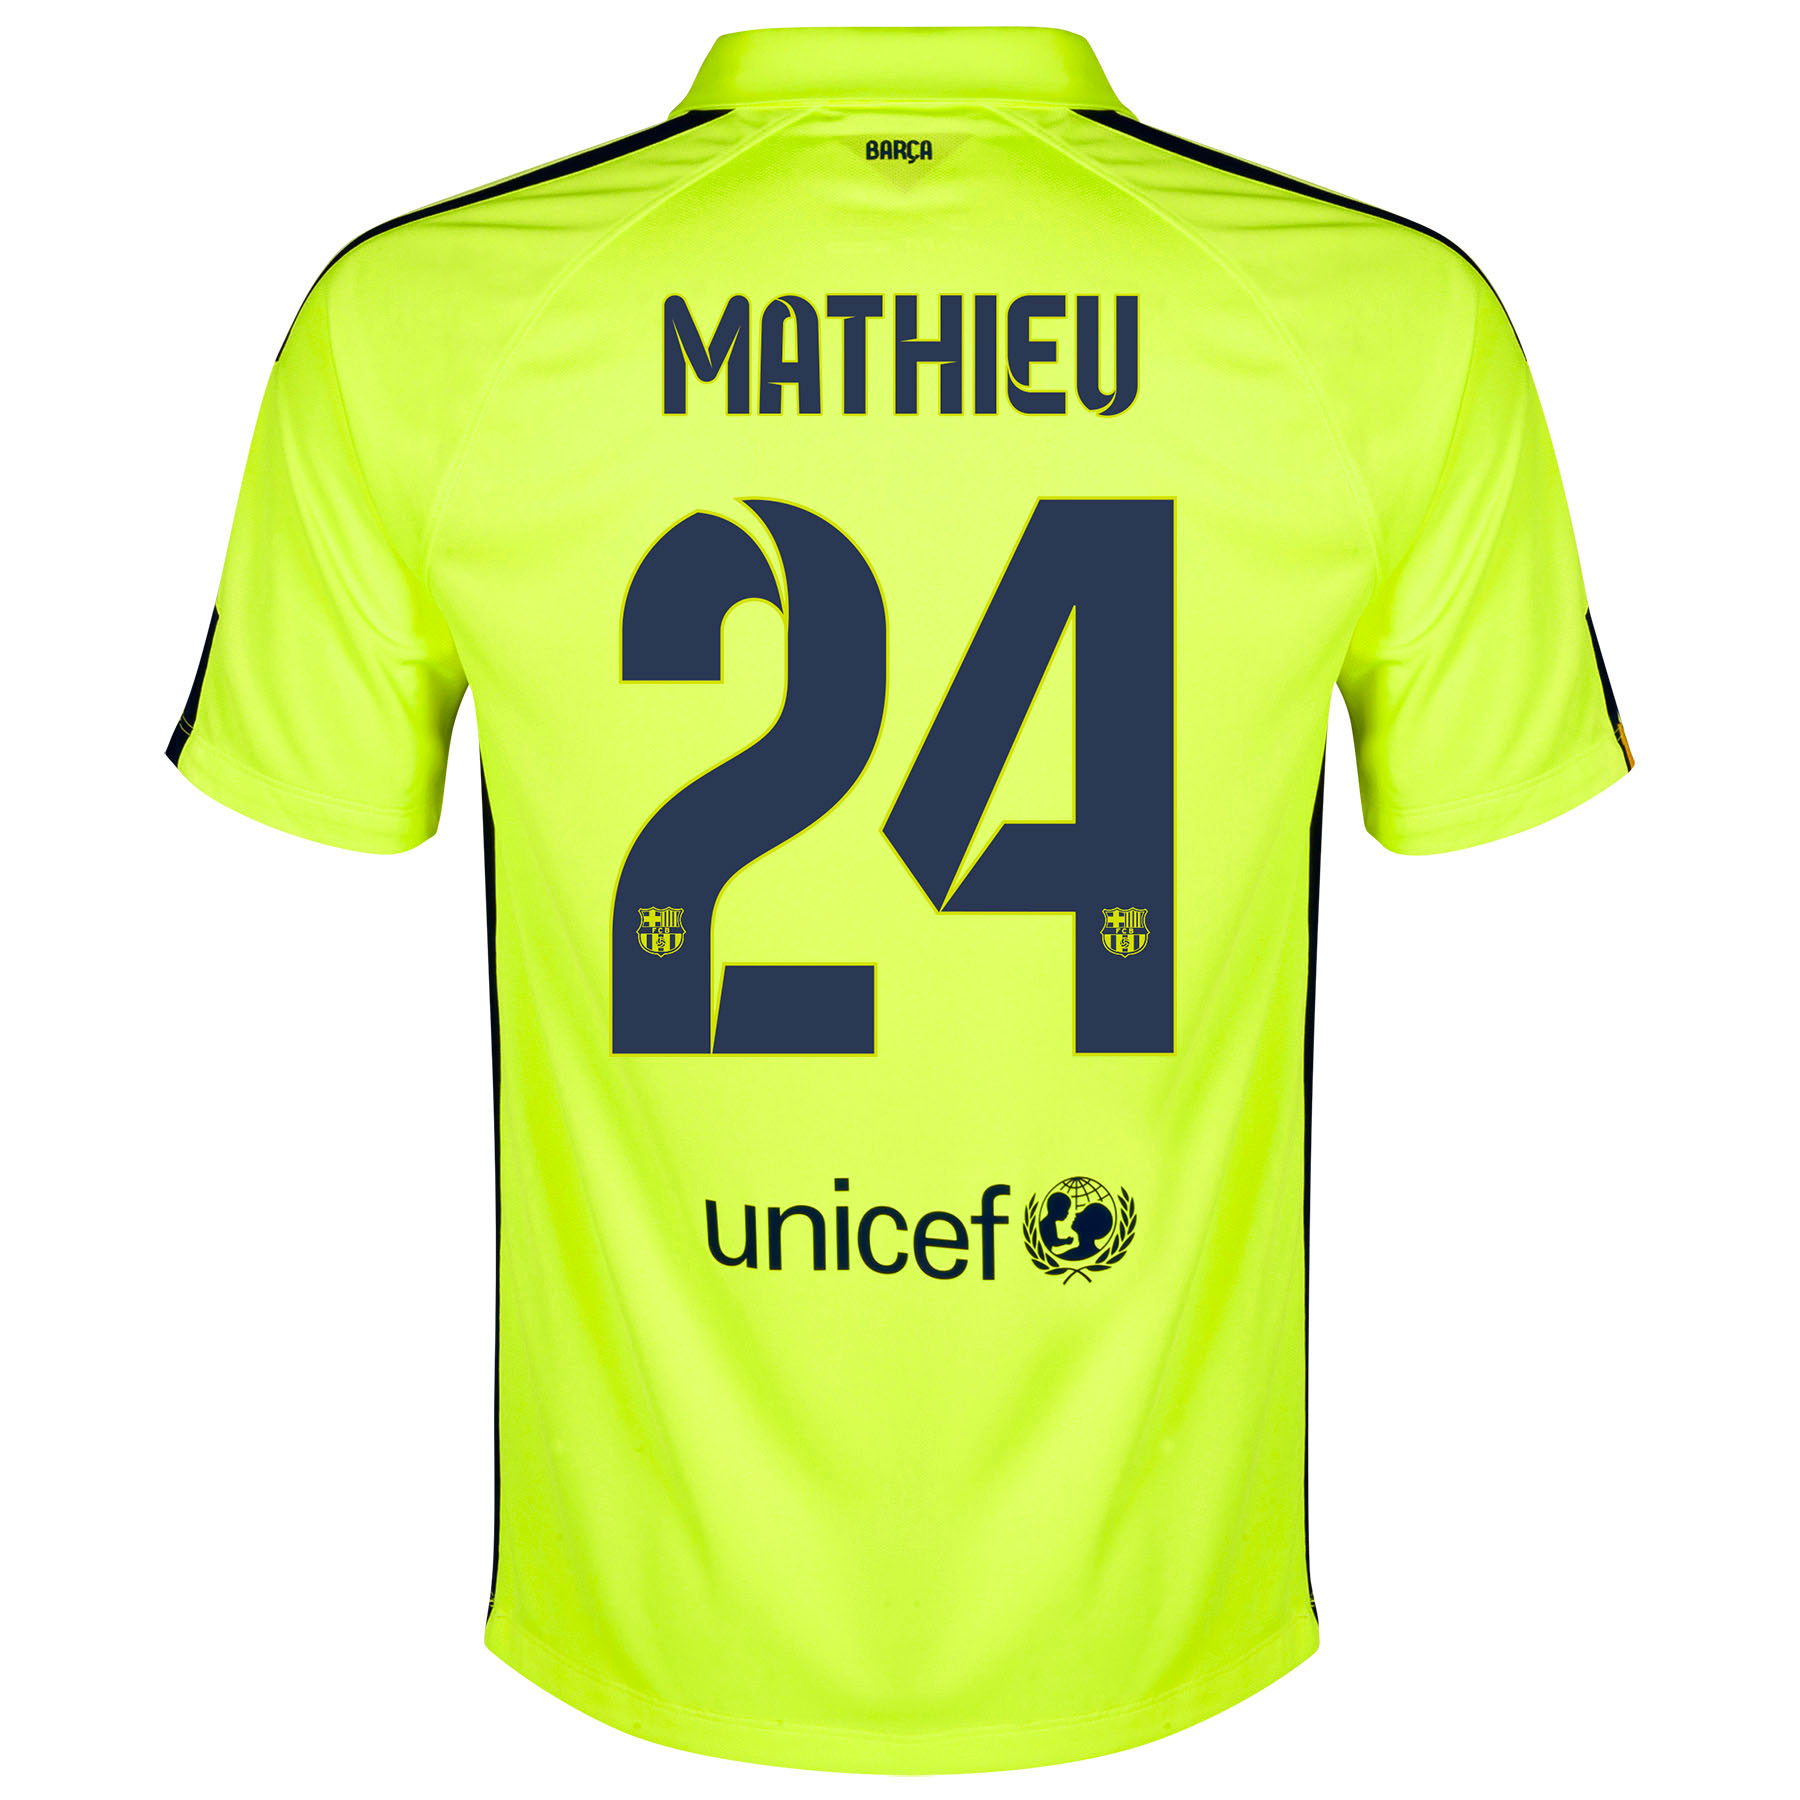 Barcelona Third Shirt 2014/15 Yellow with Mathieu 24 printing